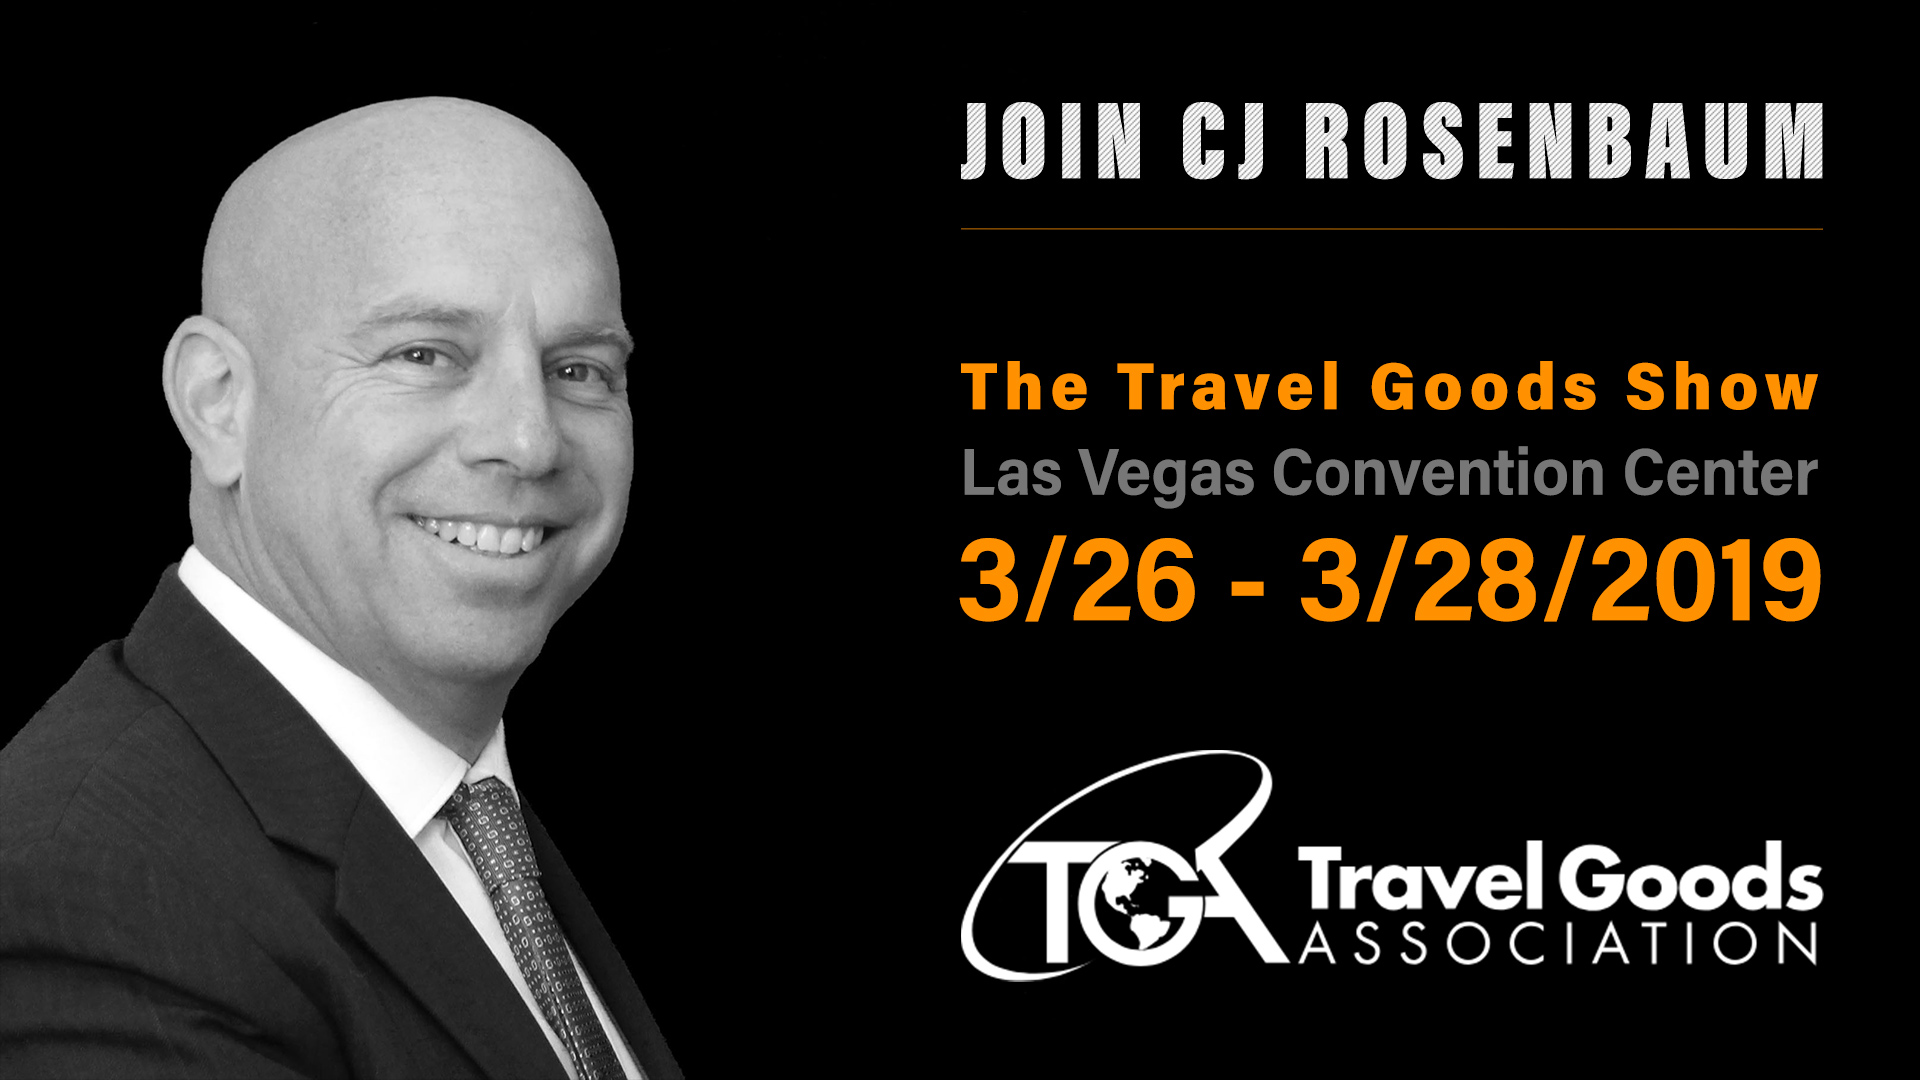 The Travel Goods Show, Las Vegas Convention Center